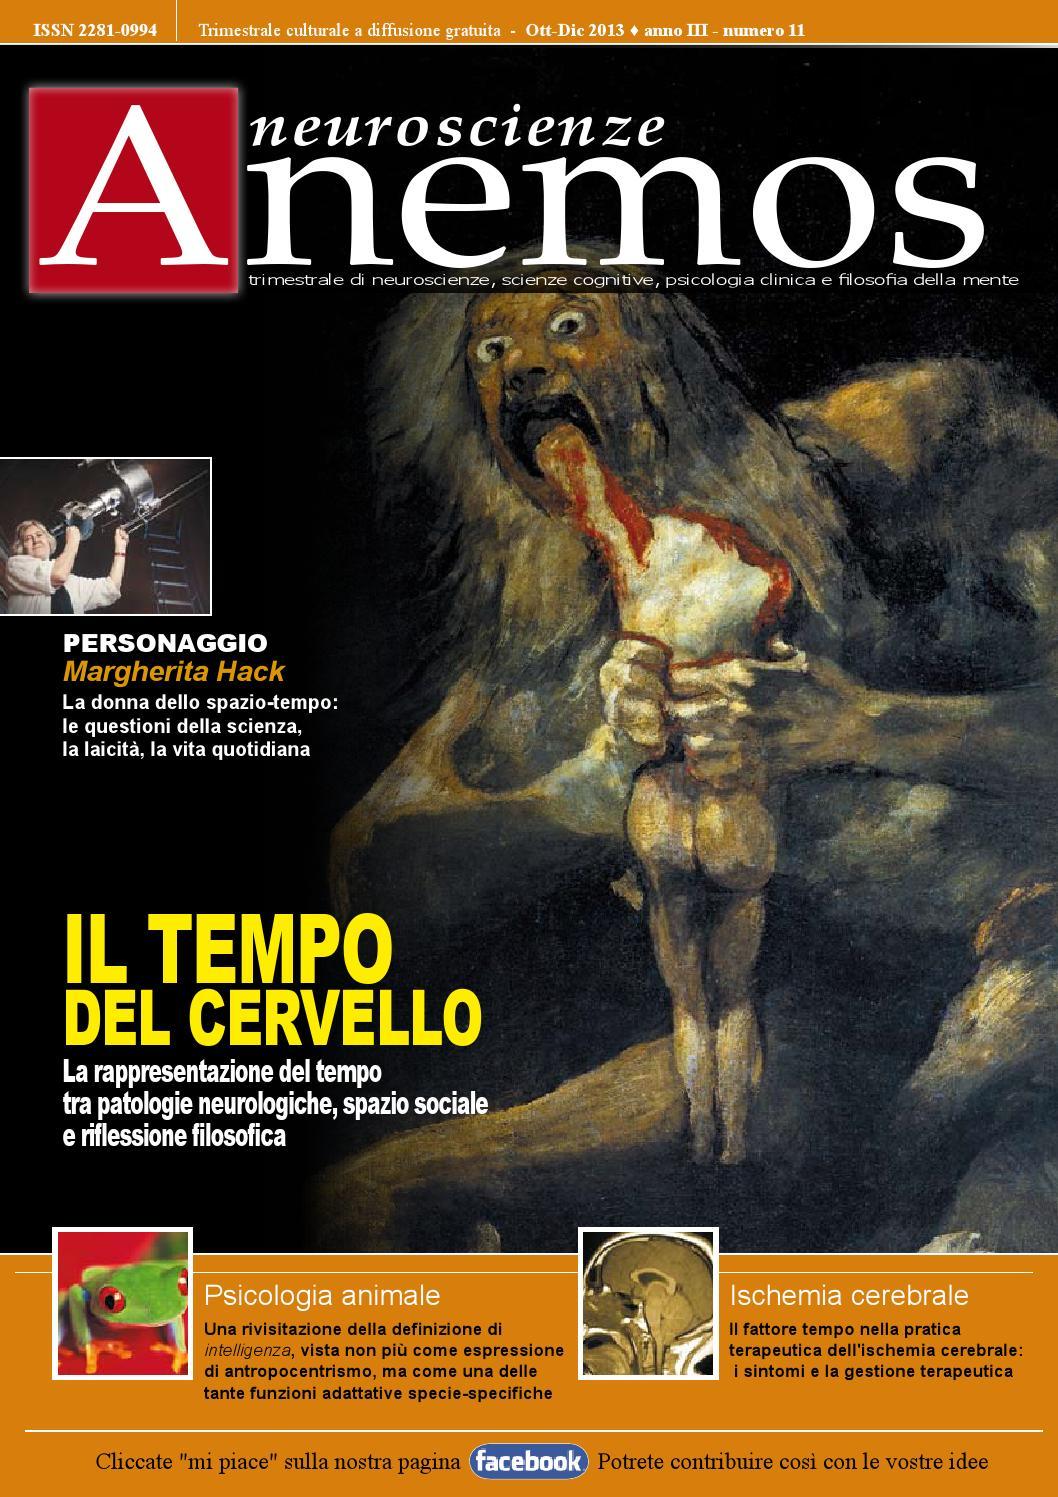 "Neuroscienze Anemos"" Ott Dic 2013 Anno III N 11 By La Clessidra"